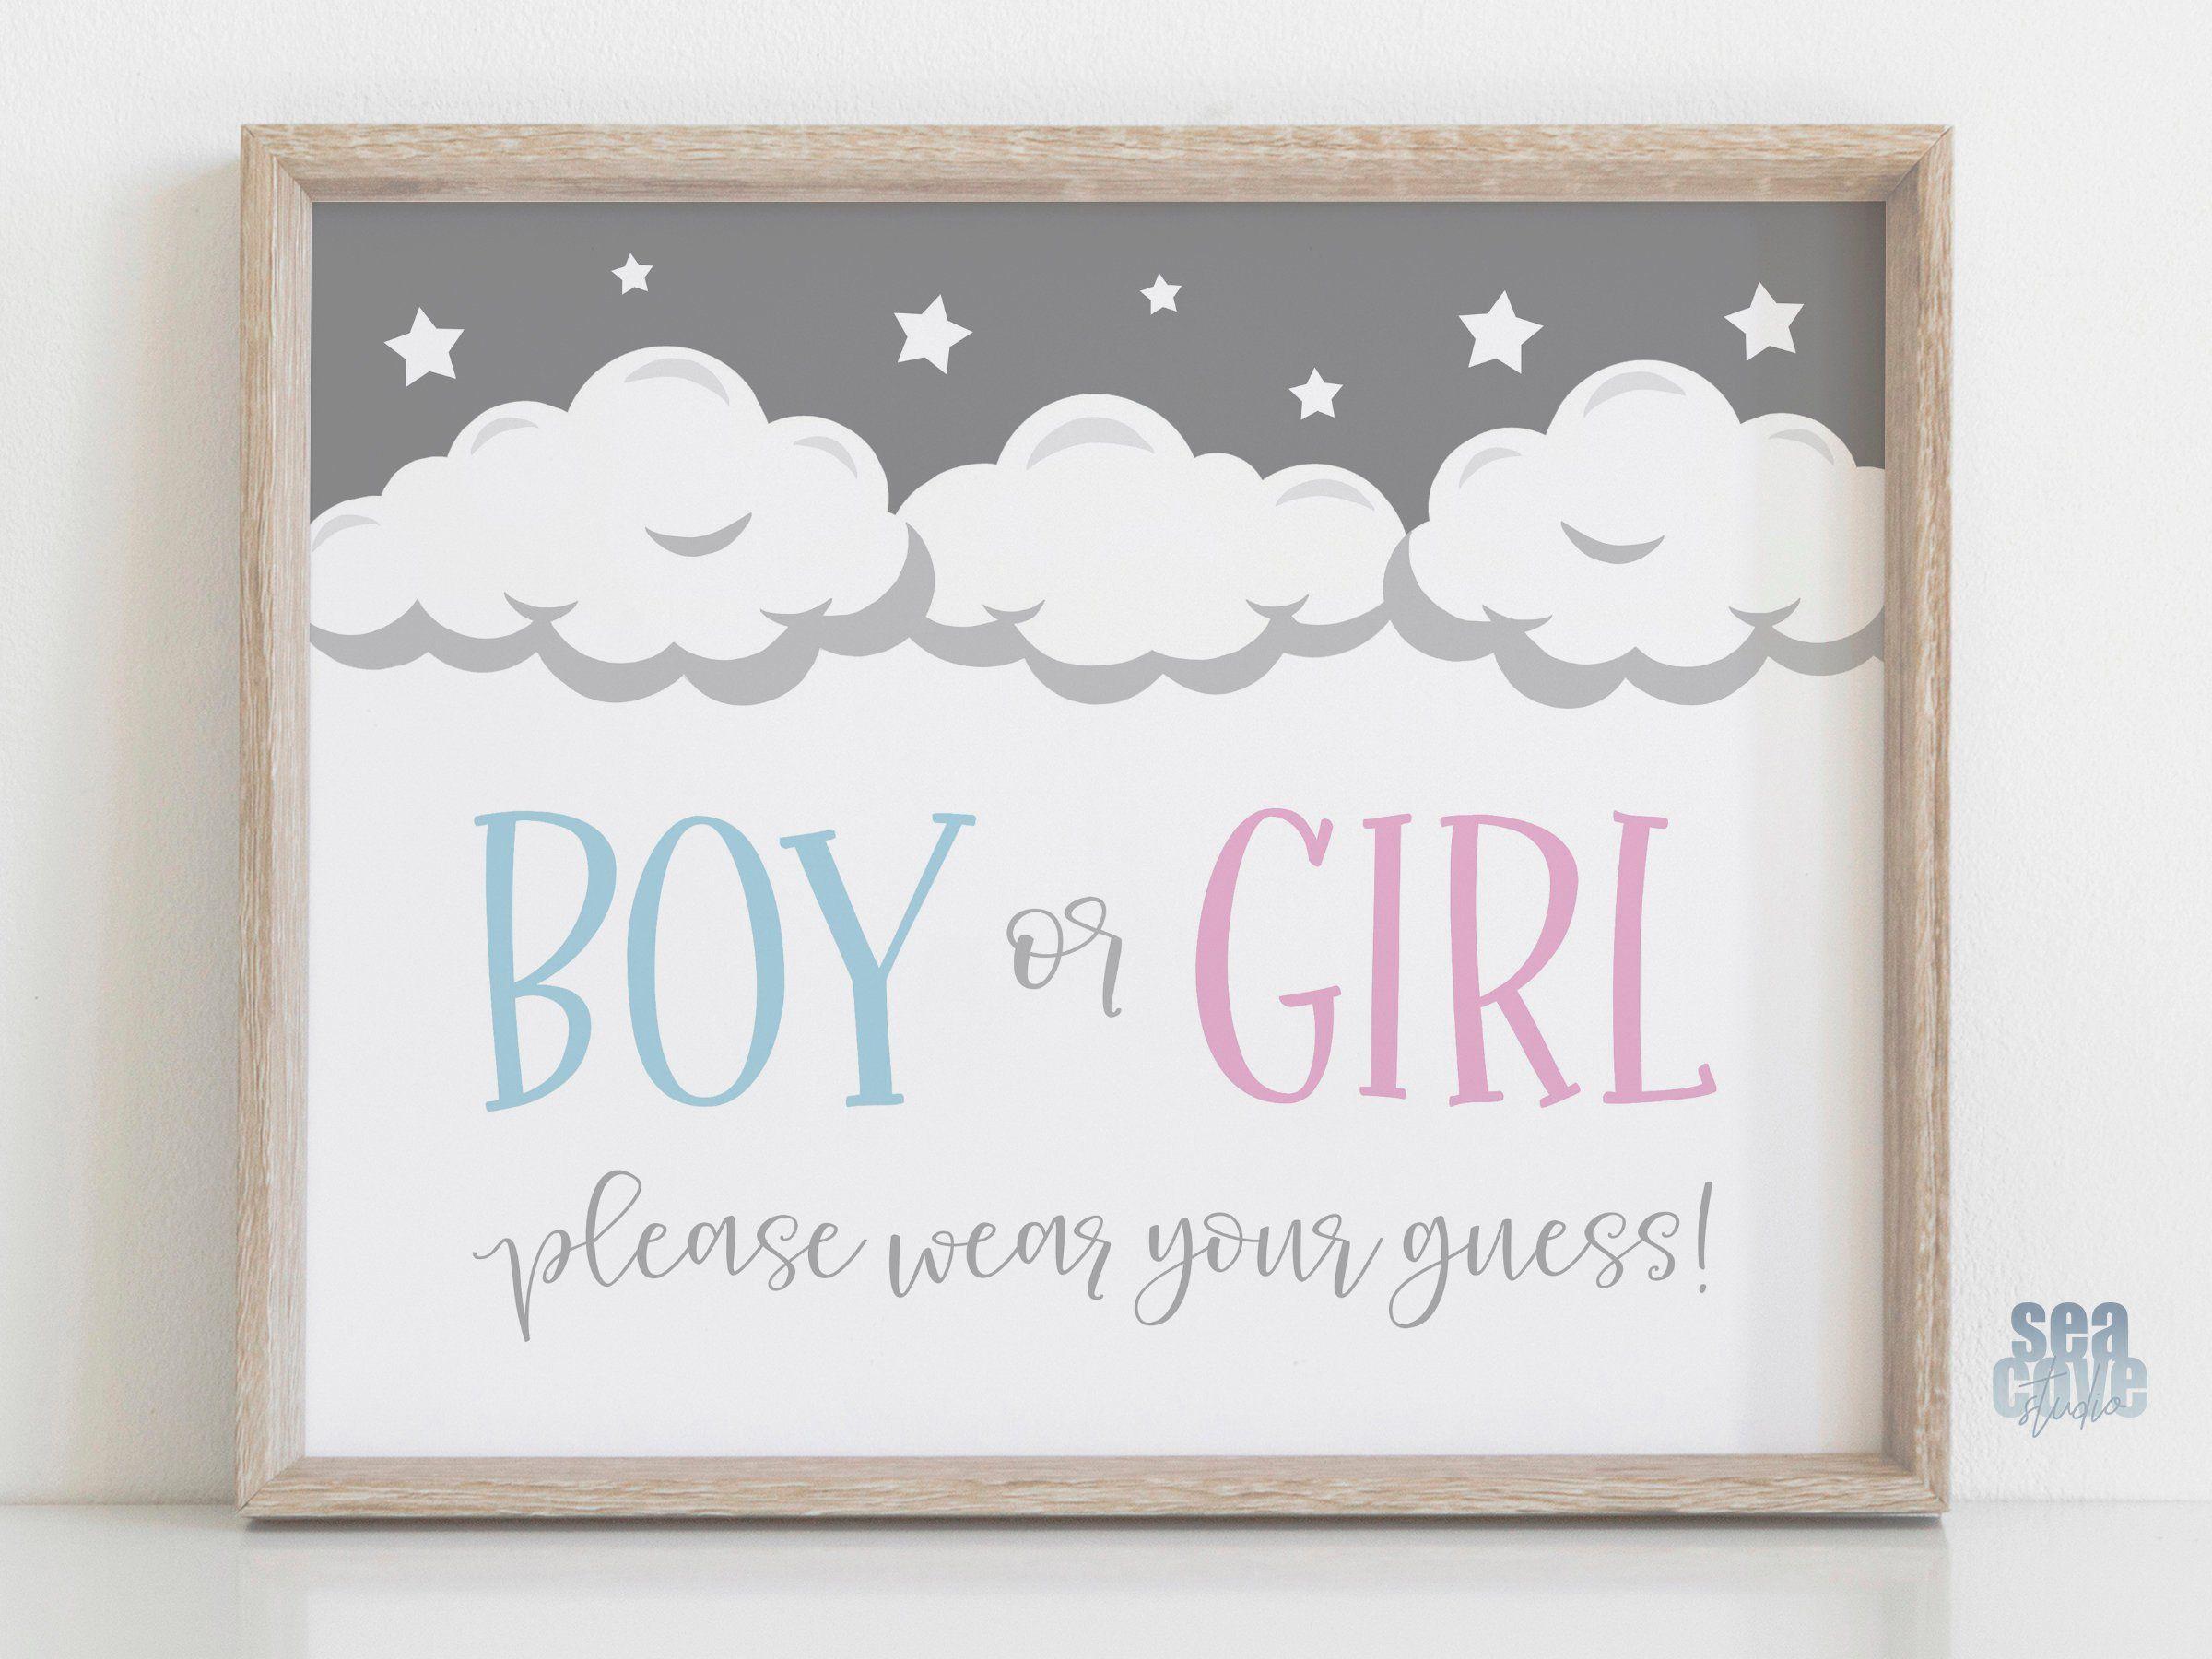 Boy Or Girl Please Wear Your Guess Sign Gender Reveal Etsy In 2021 Gender Reveal Decorations Gender Reveal Party Supplies Gender Reveal Party